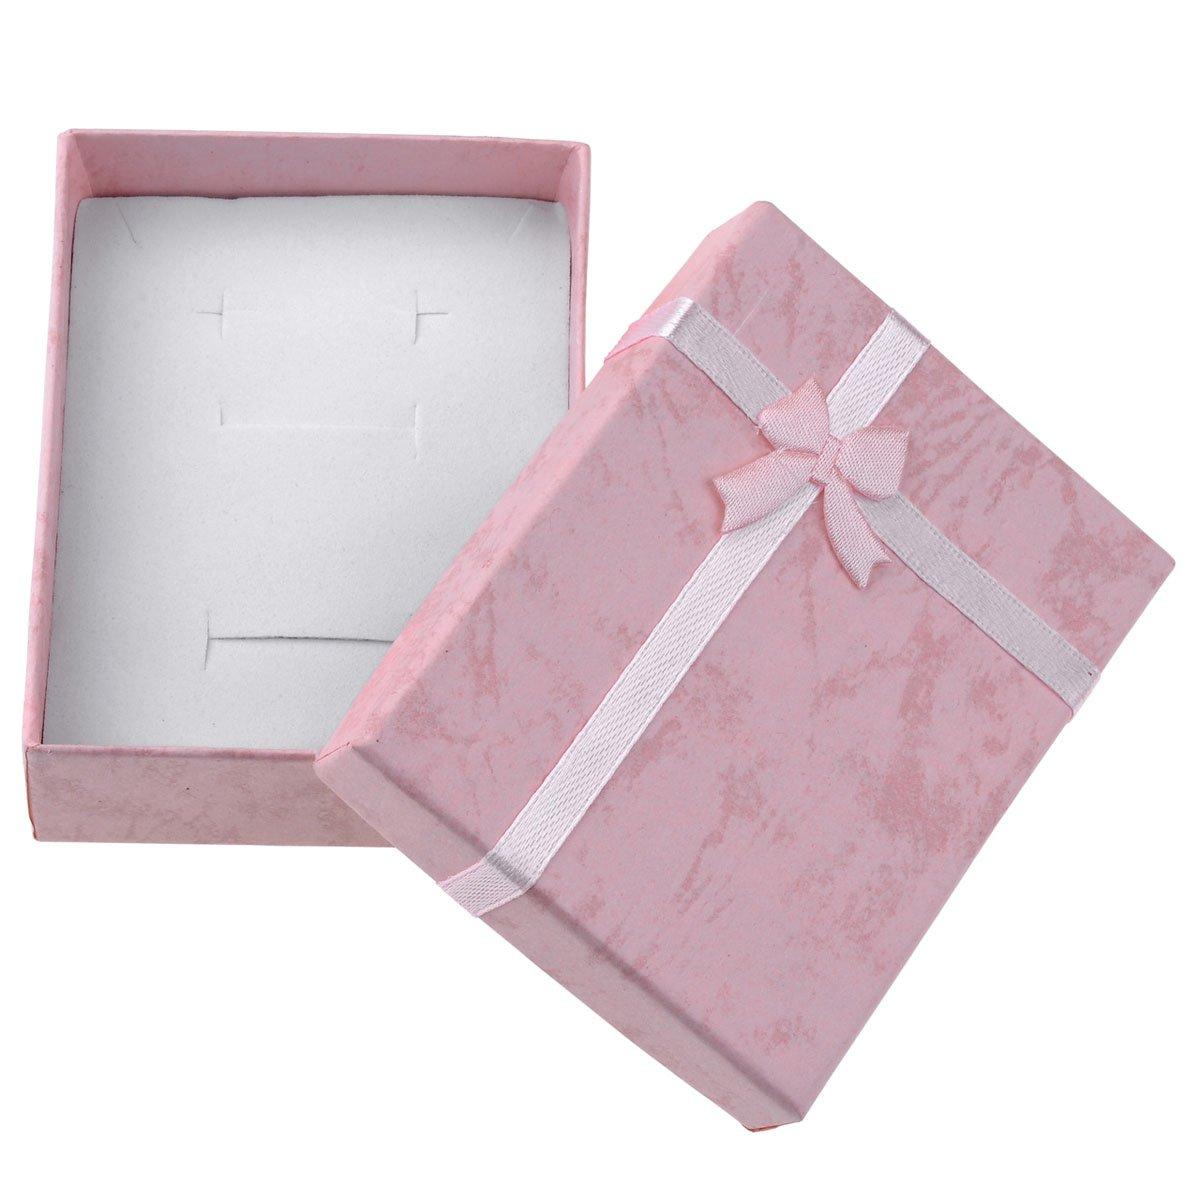 w//Gift Box CrystalTears Rose Quartz Heart-Shape Worry Stone Chakra Healing Crystal Pocket Palm Stone